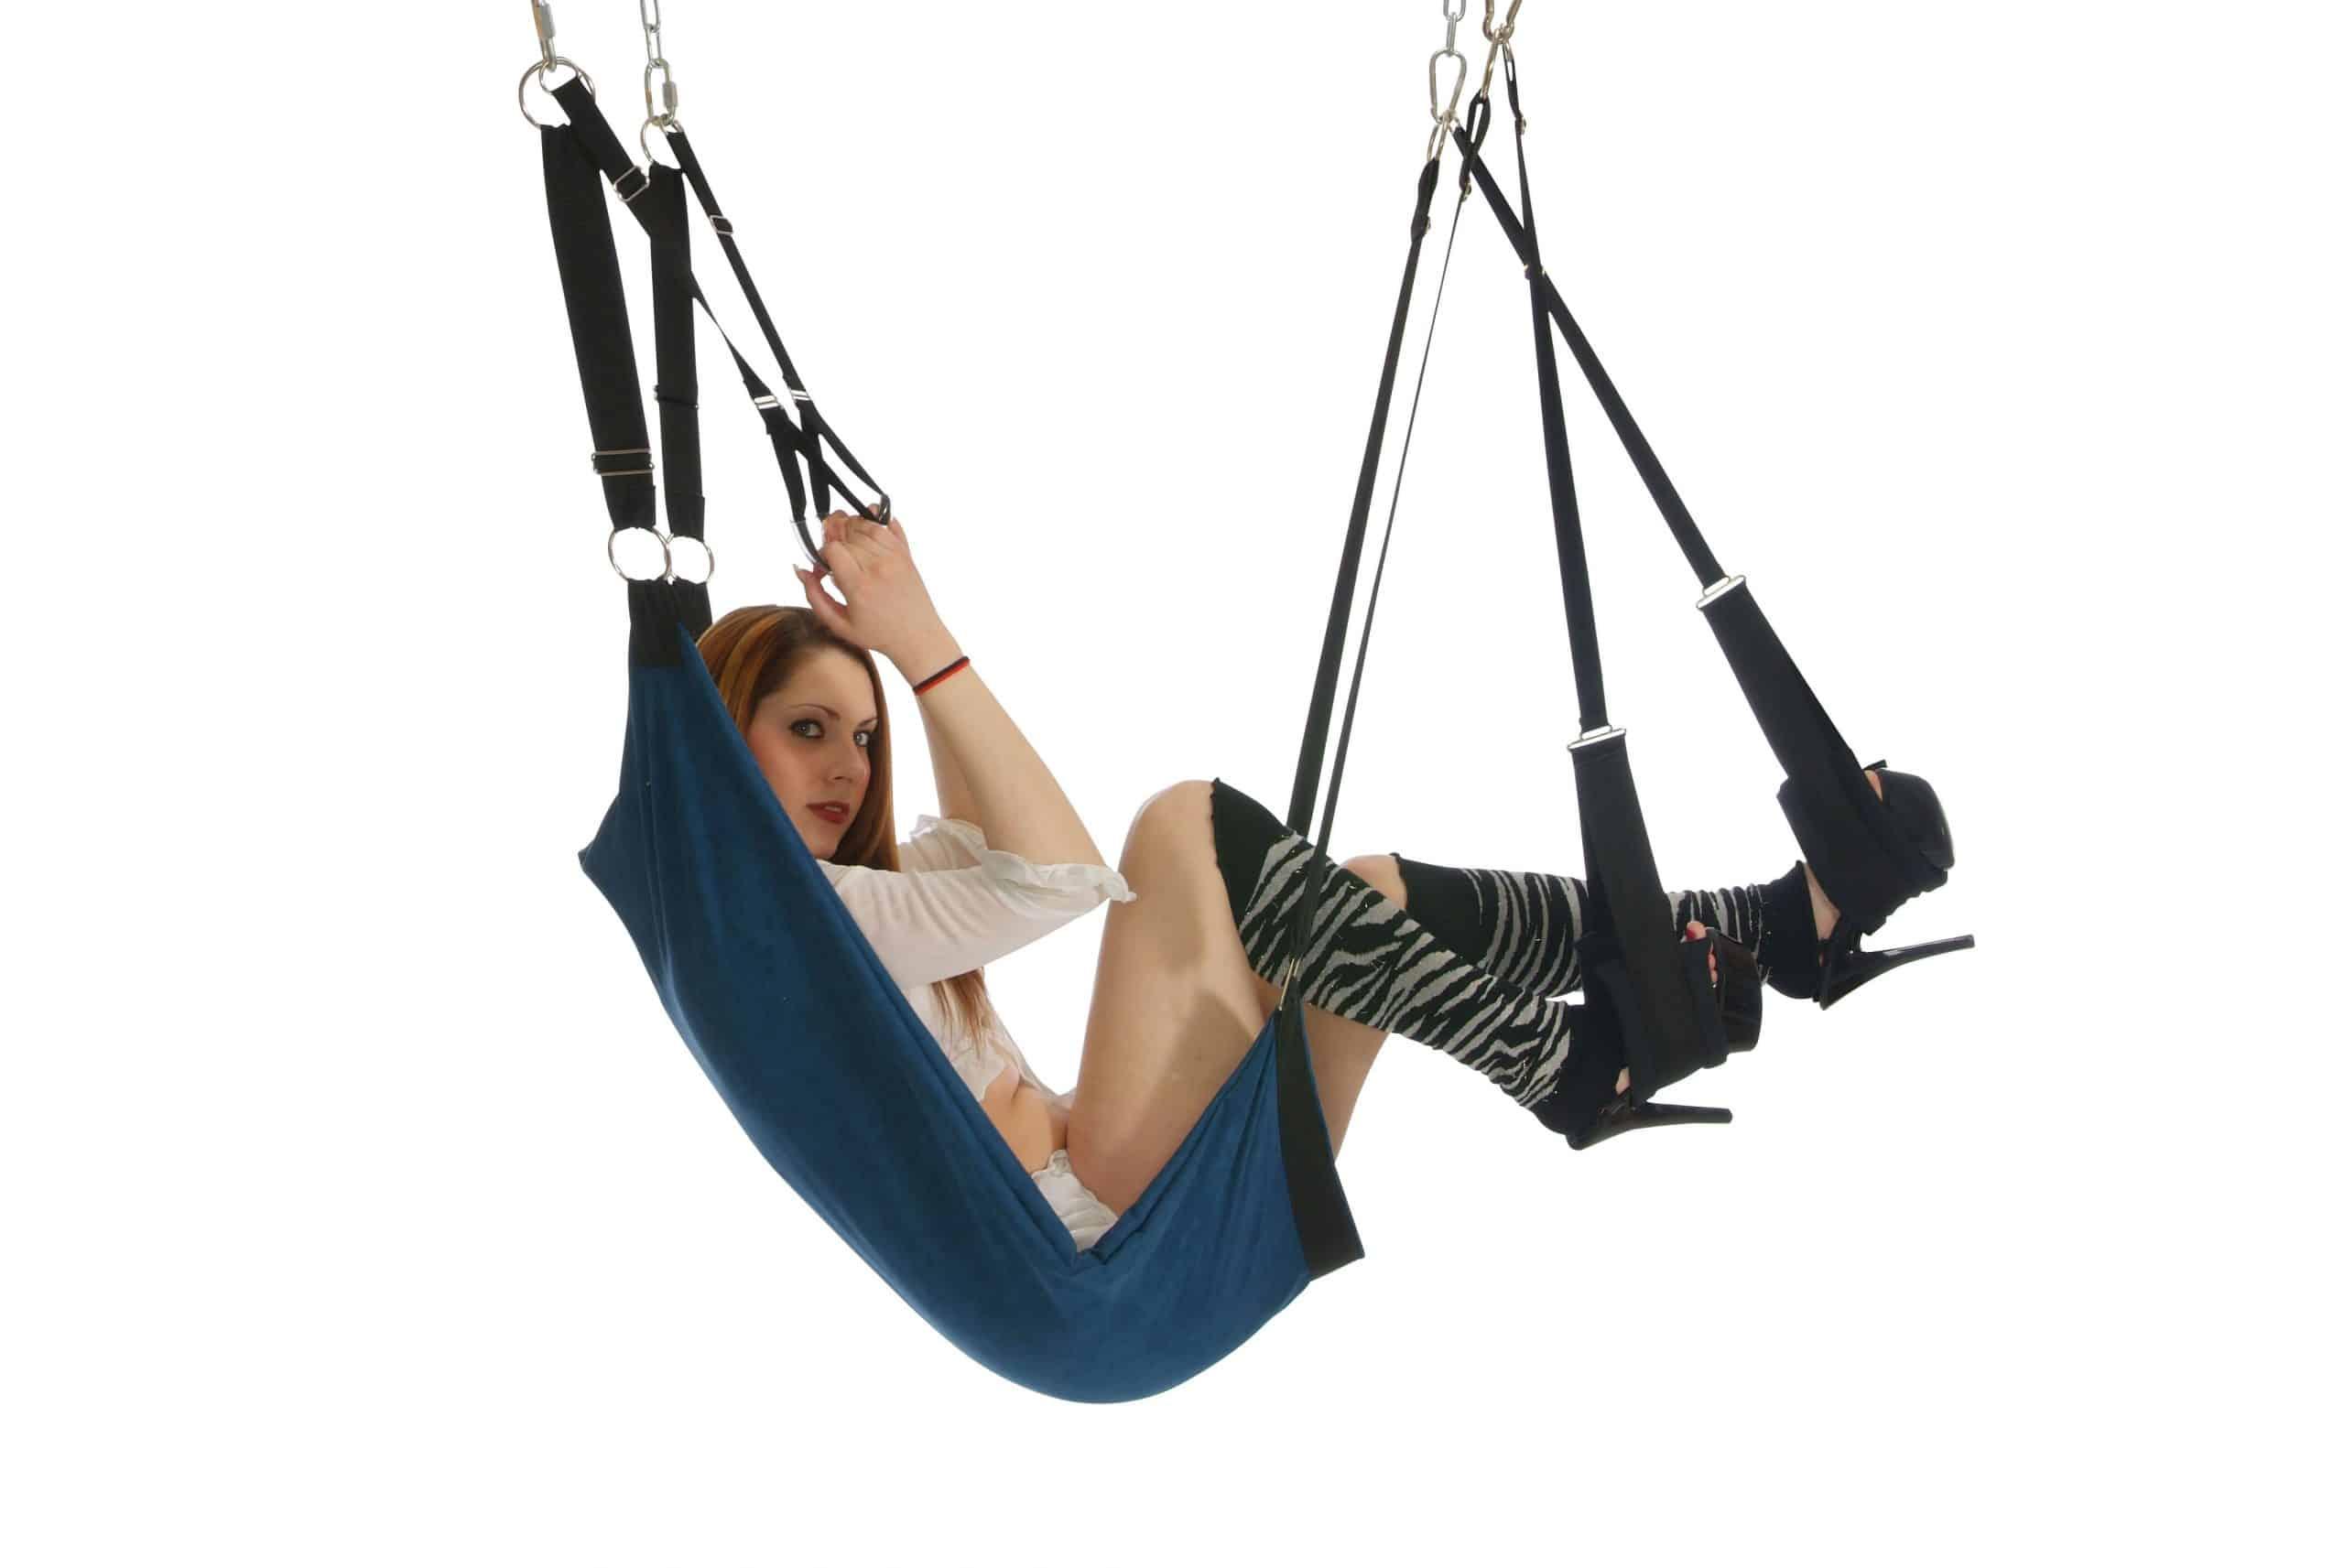 Web leather sex sling